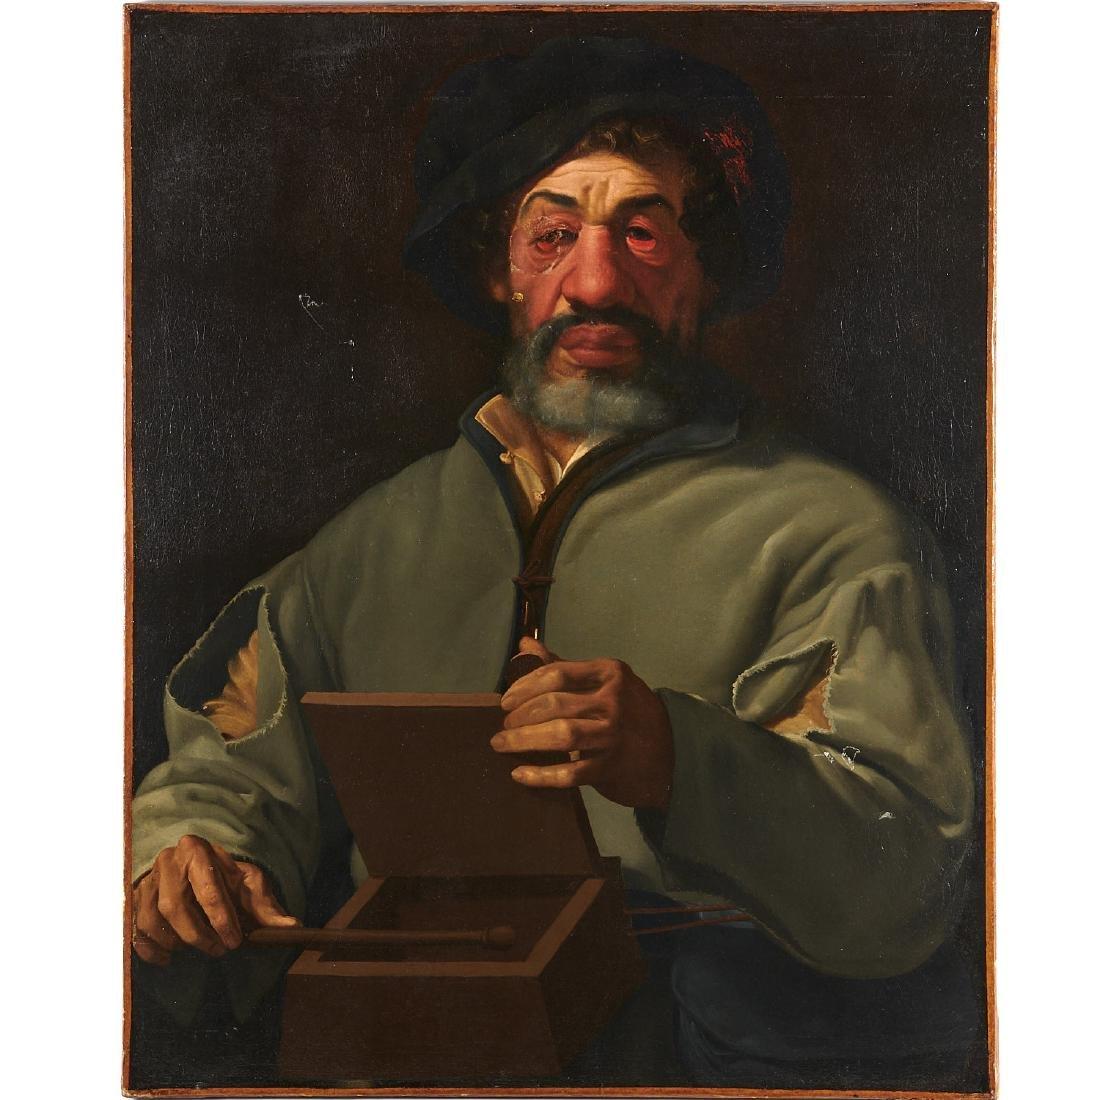 Utrecht School, The Magician, 17th/18th c.